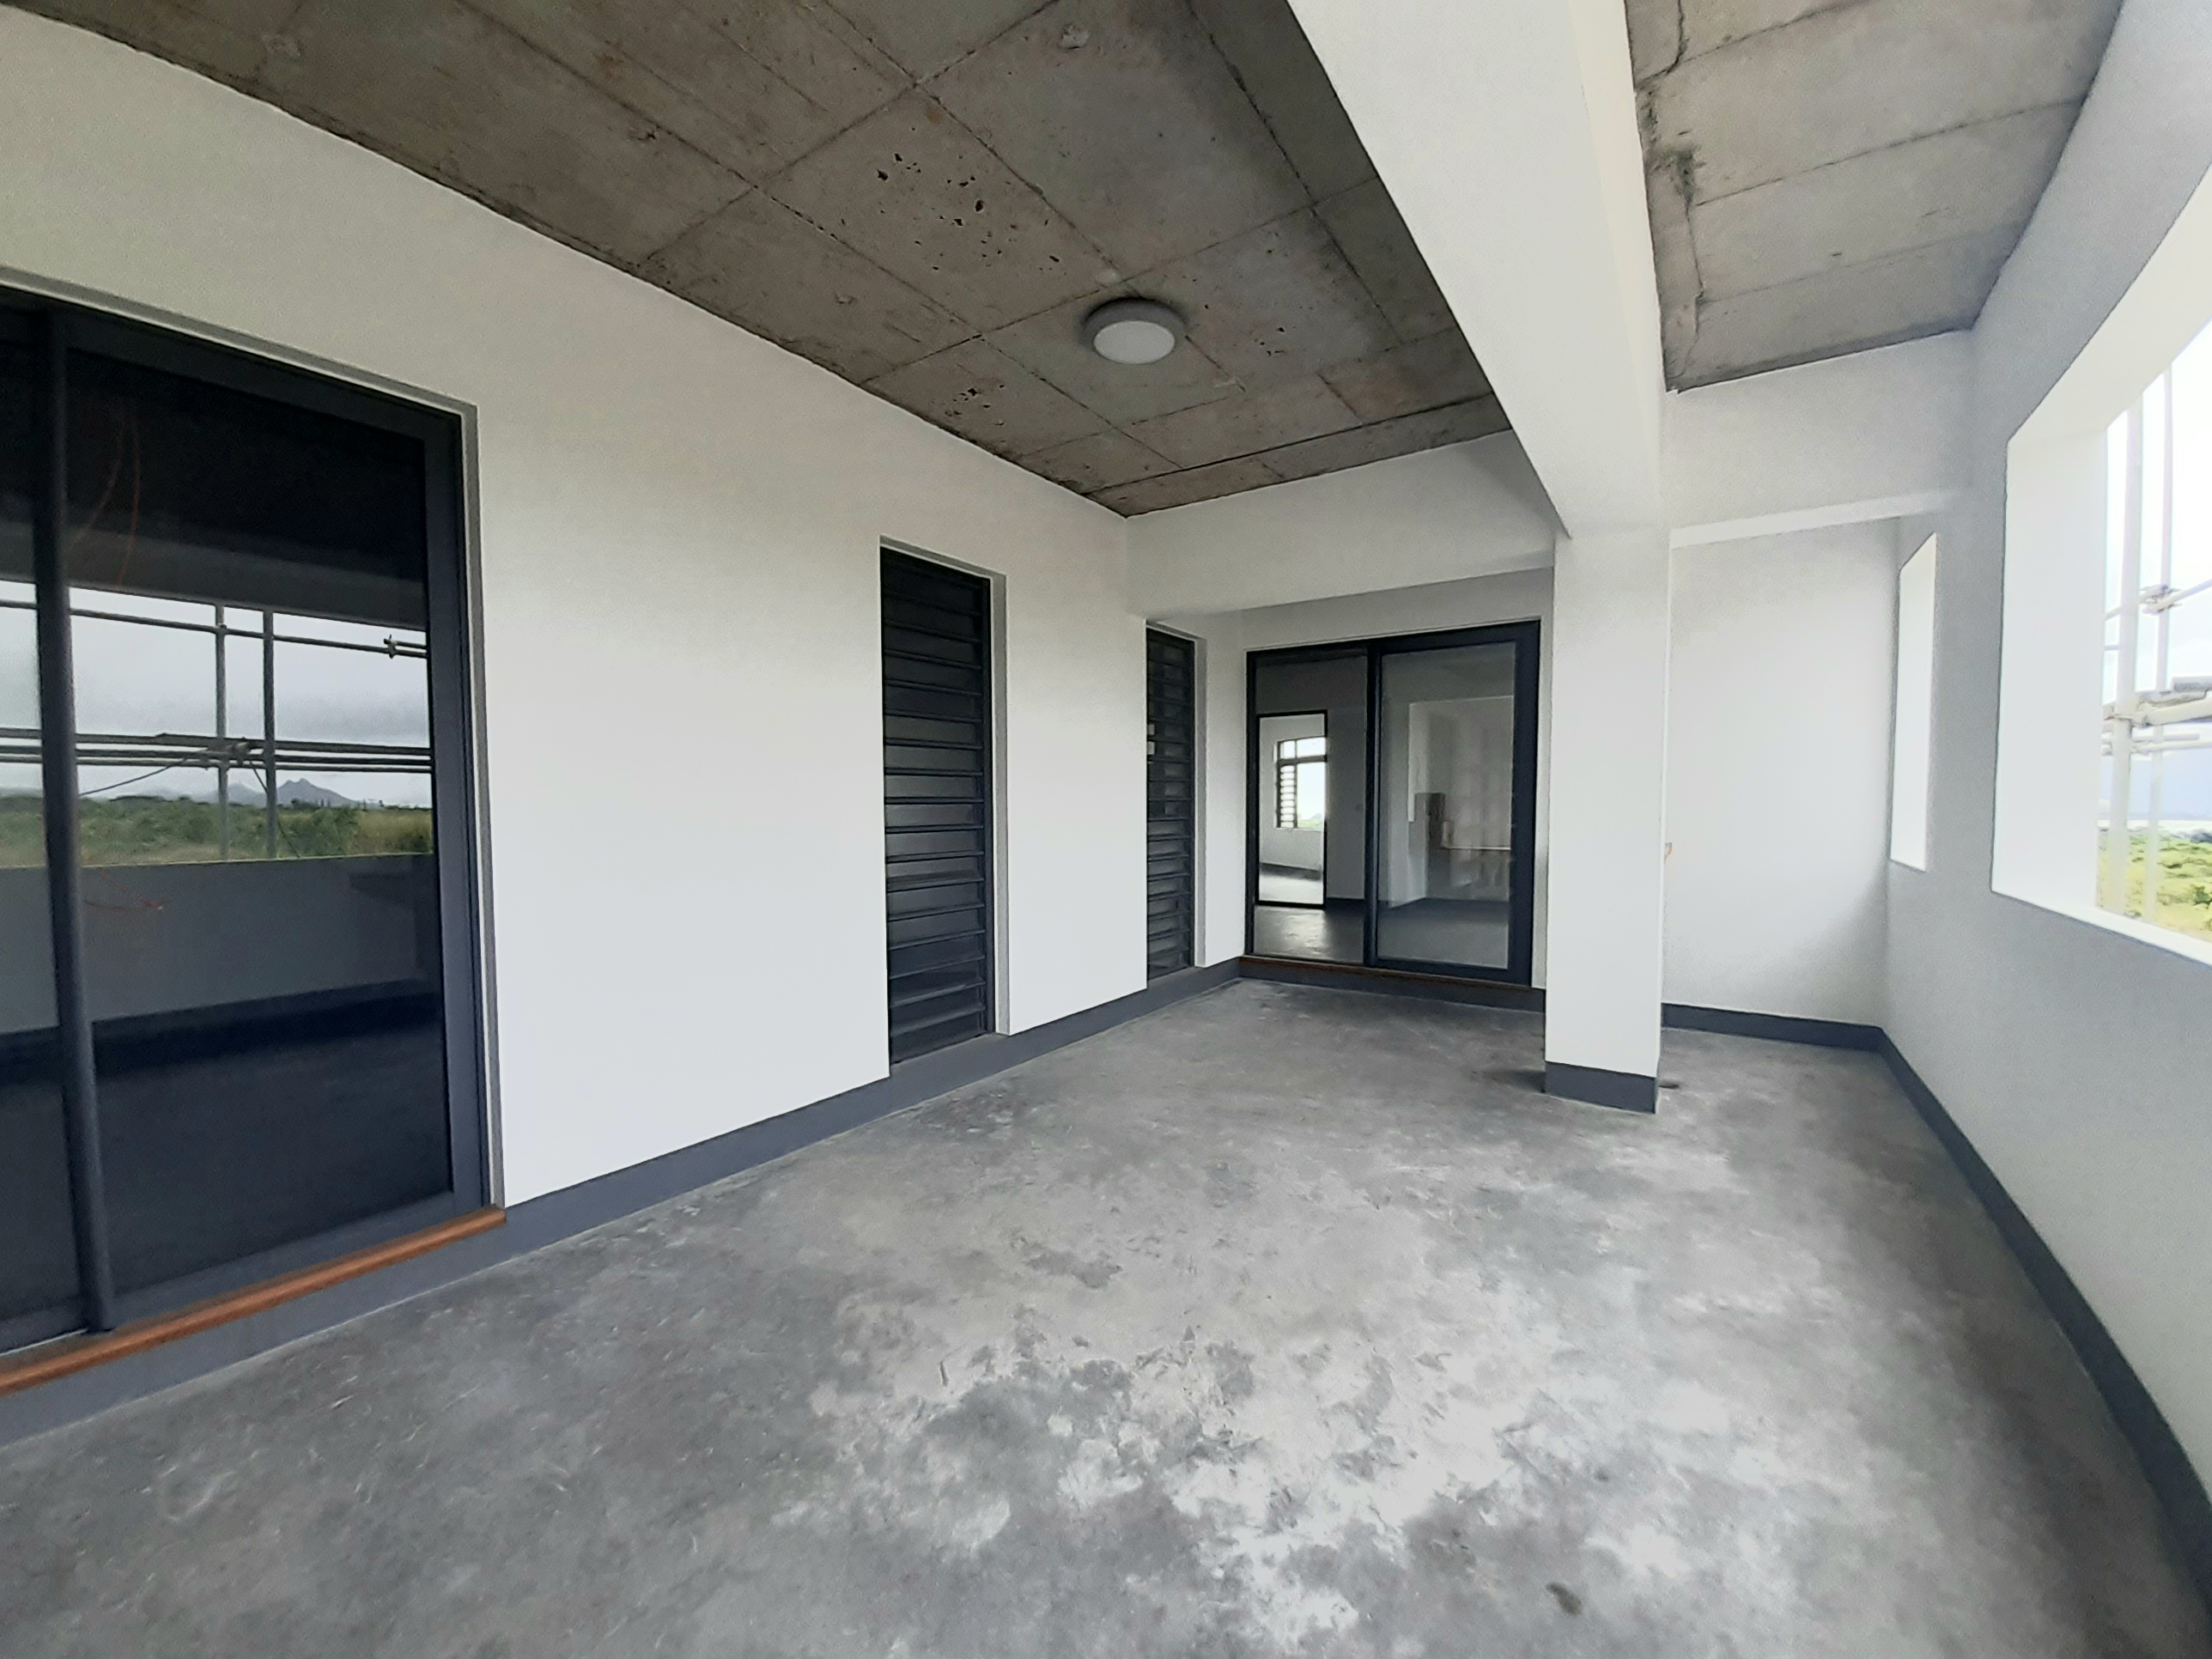 Bureau neuf de 67 metres carrés